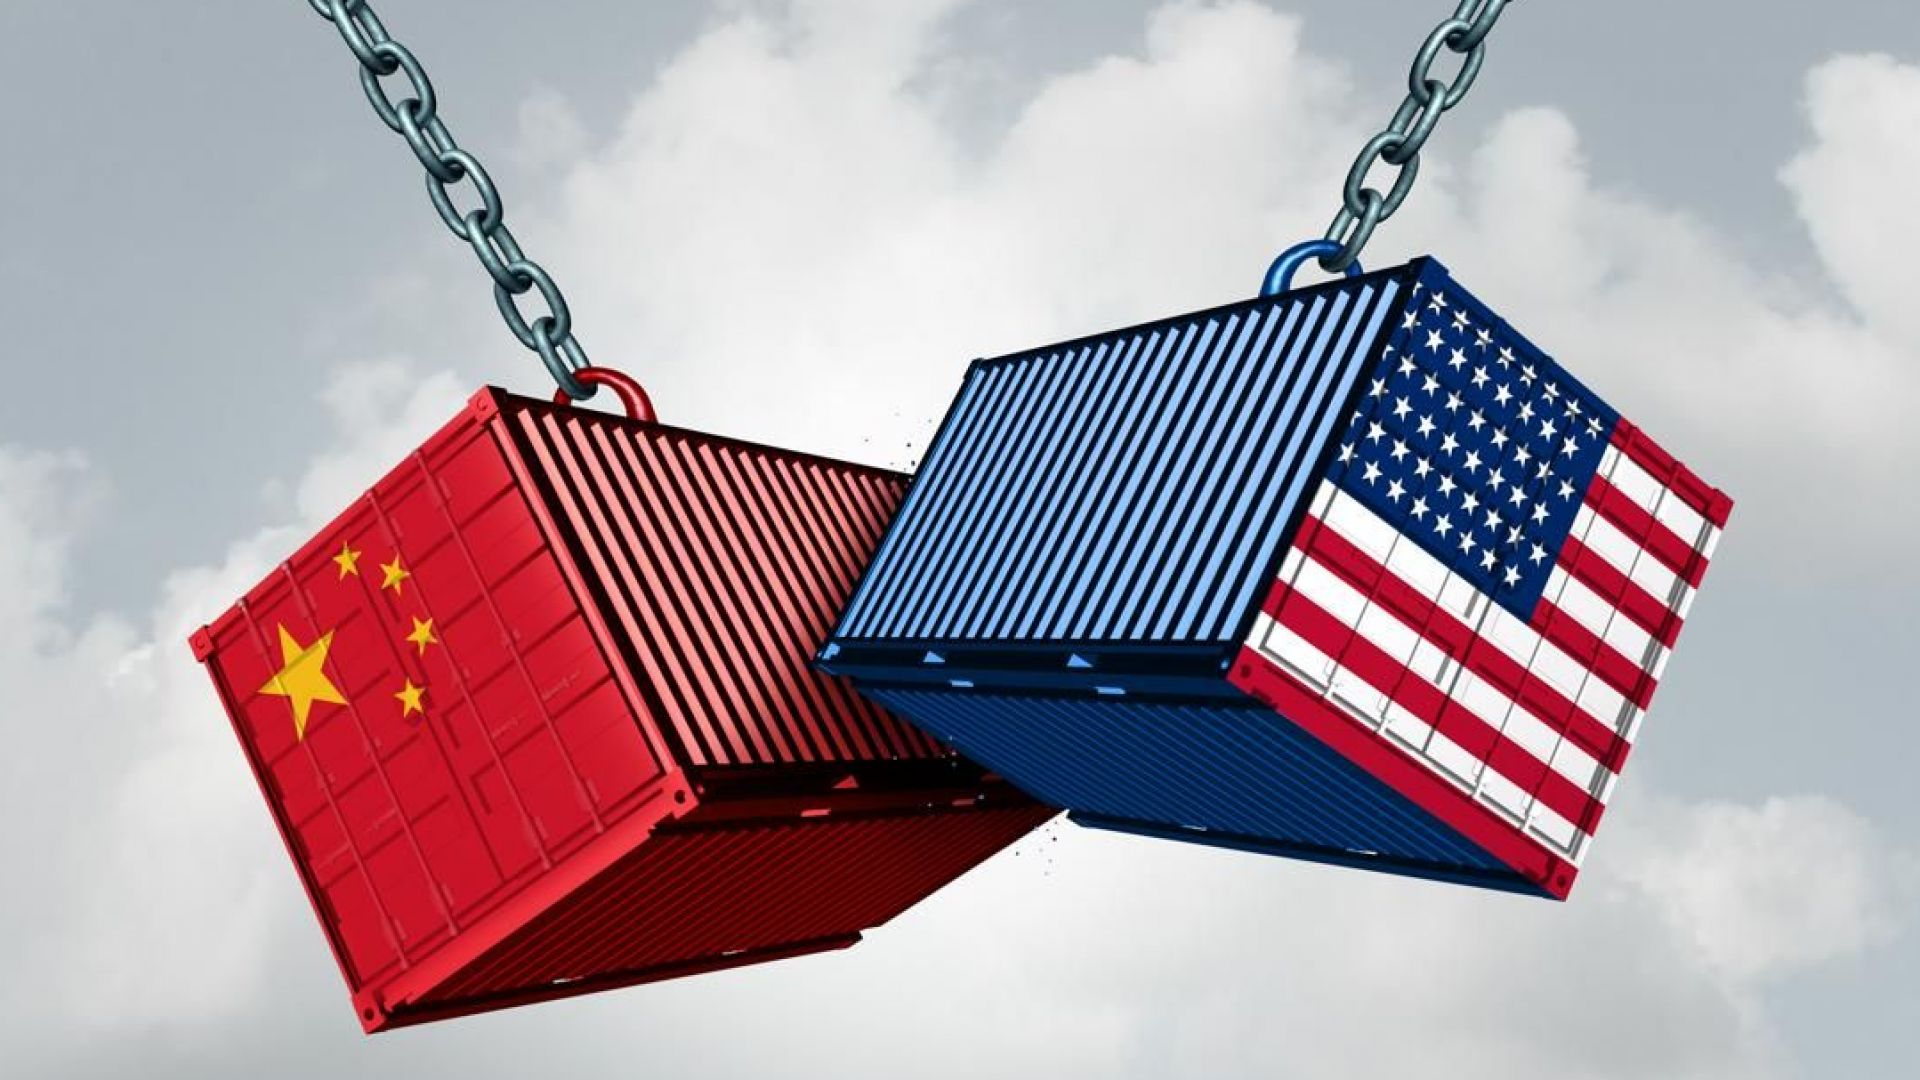 САЩ с нов икономически удар срещу Китай